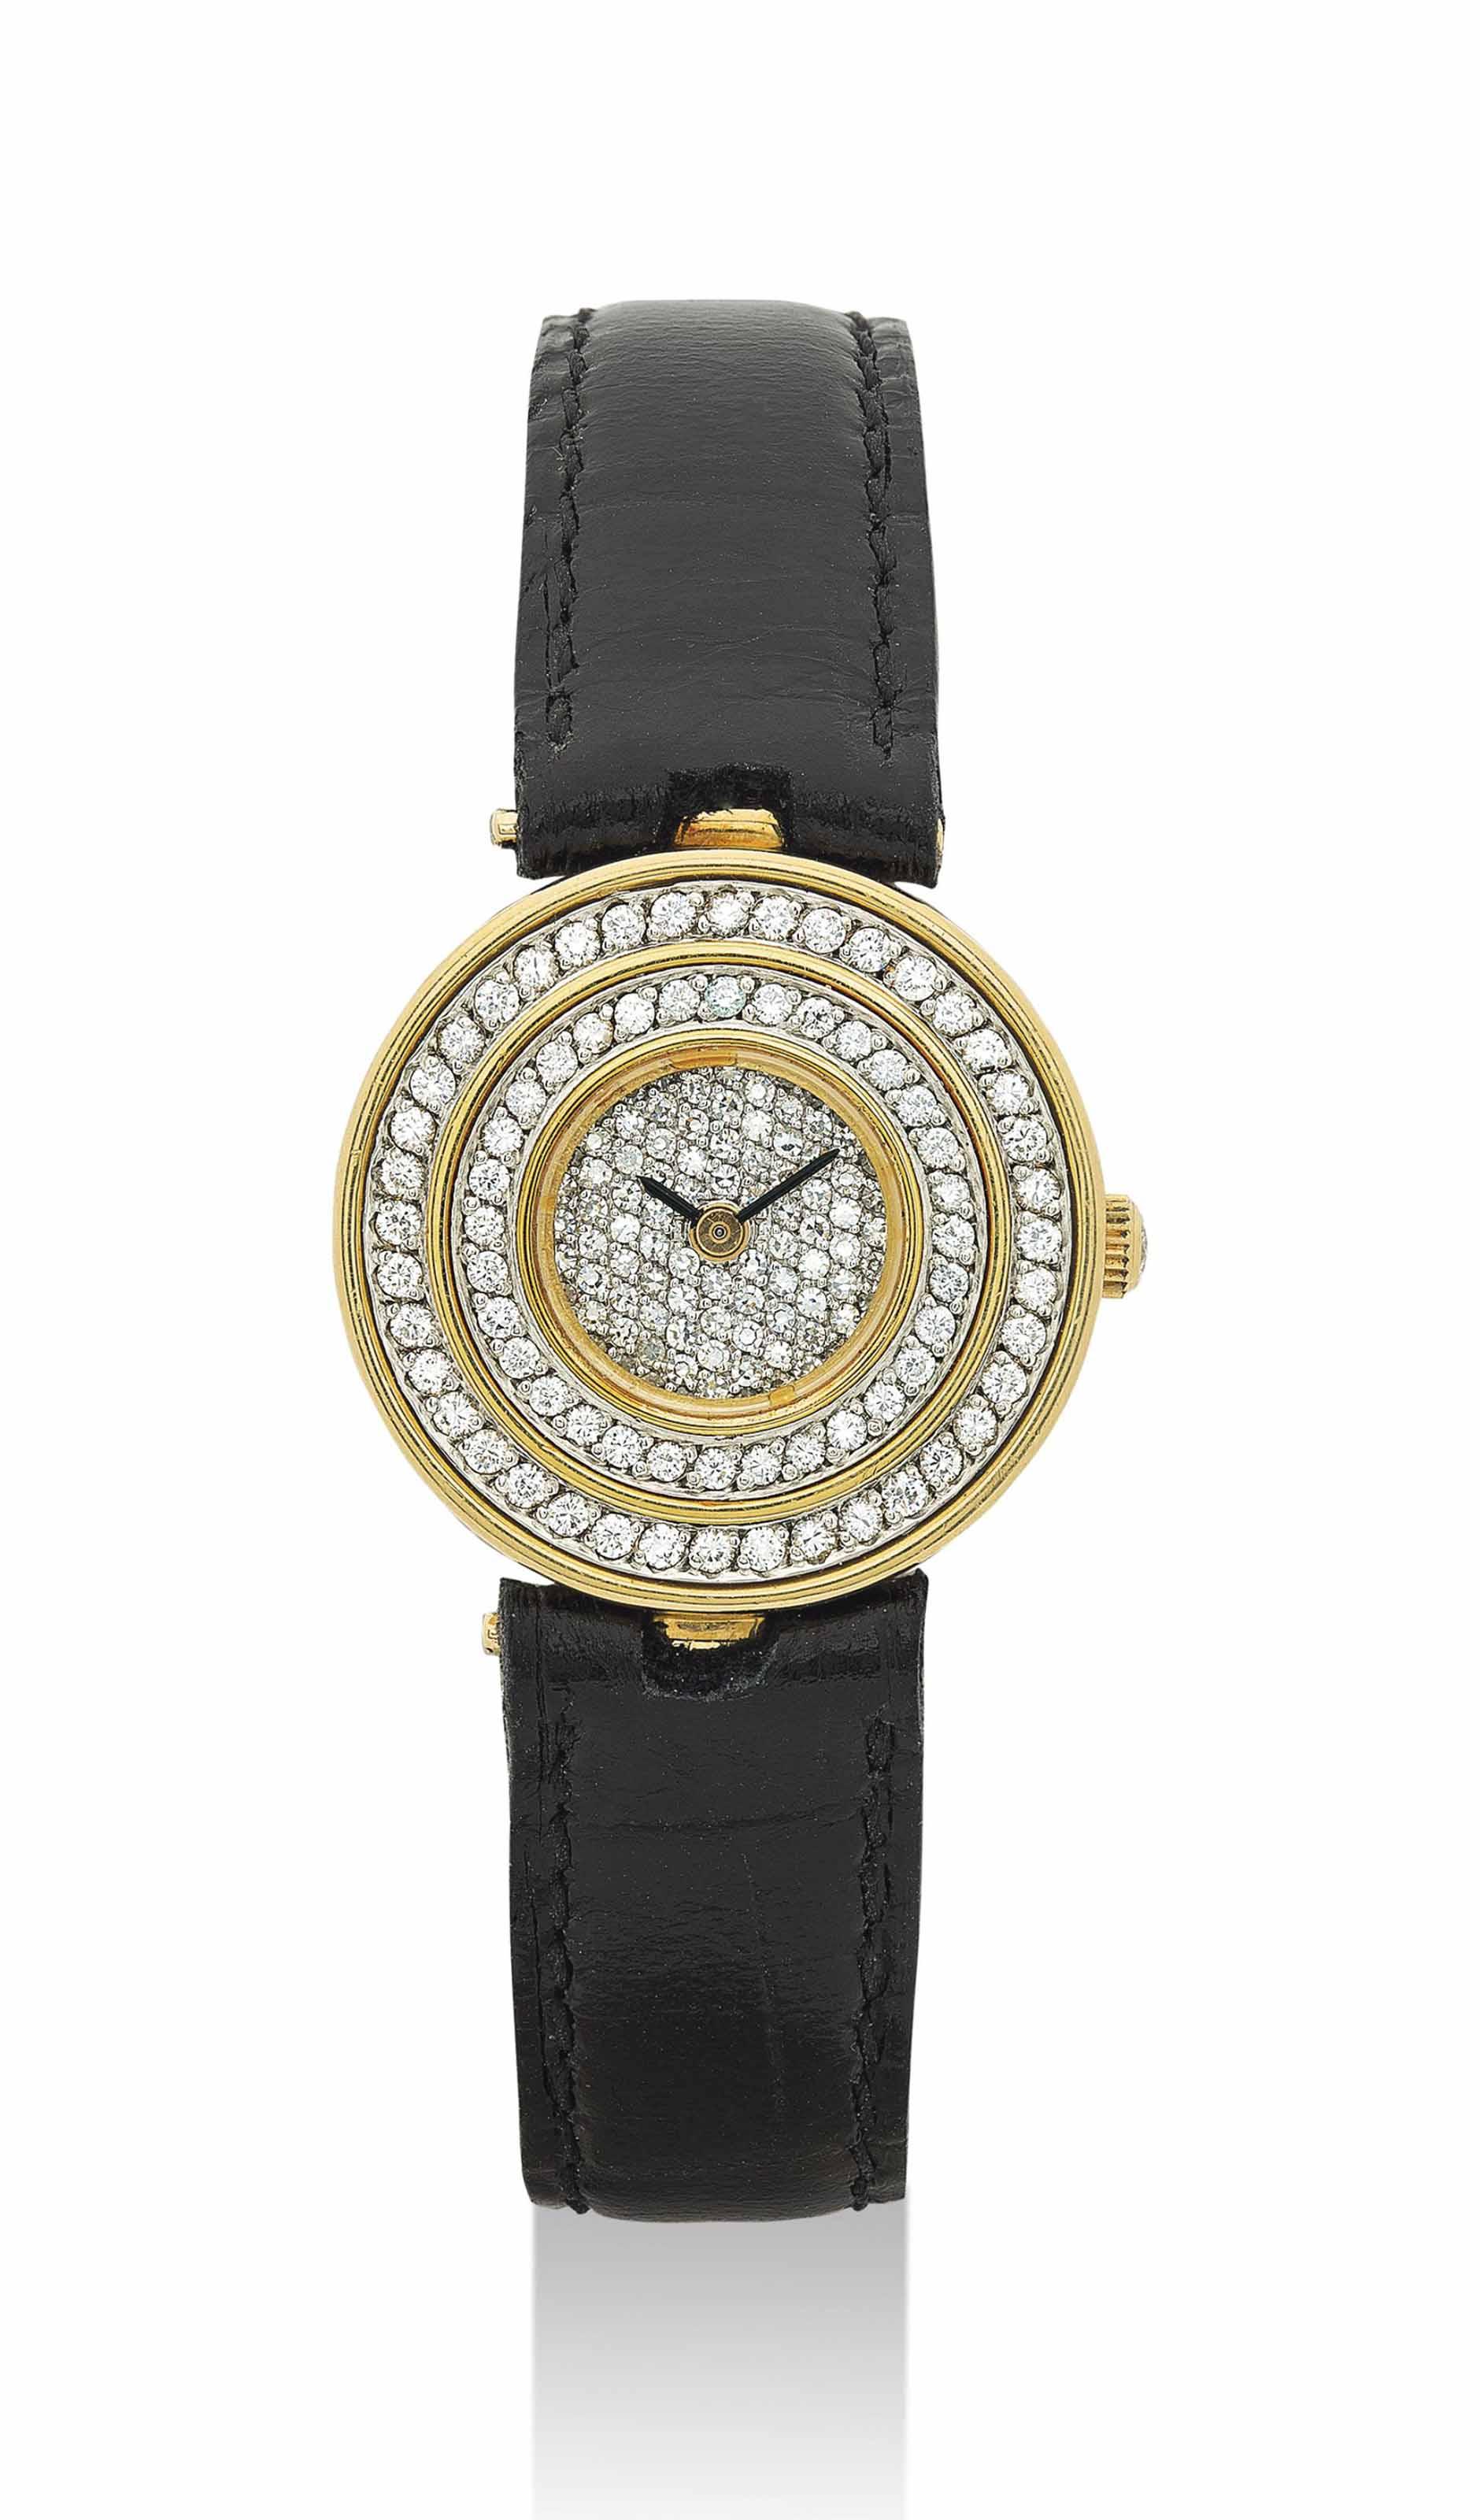 GRAFF. A LADY'S FINE 18K GOLD AND DIAMOND-SET WRISTWATCH